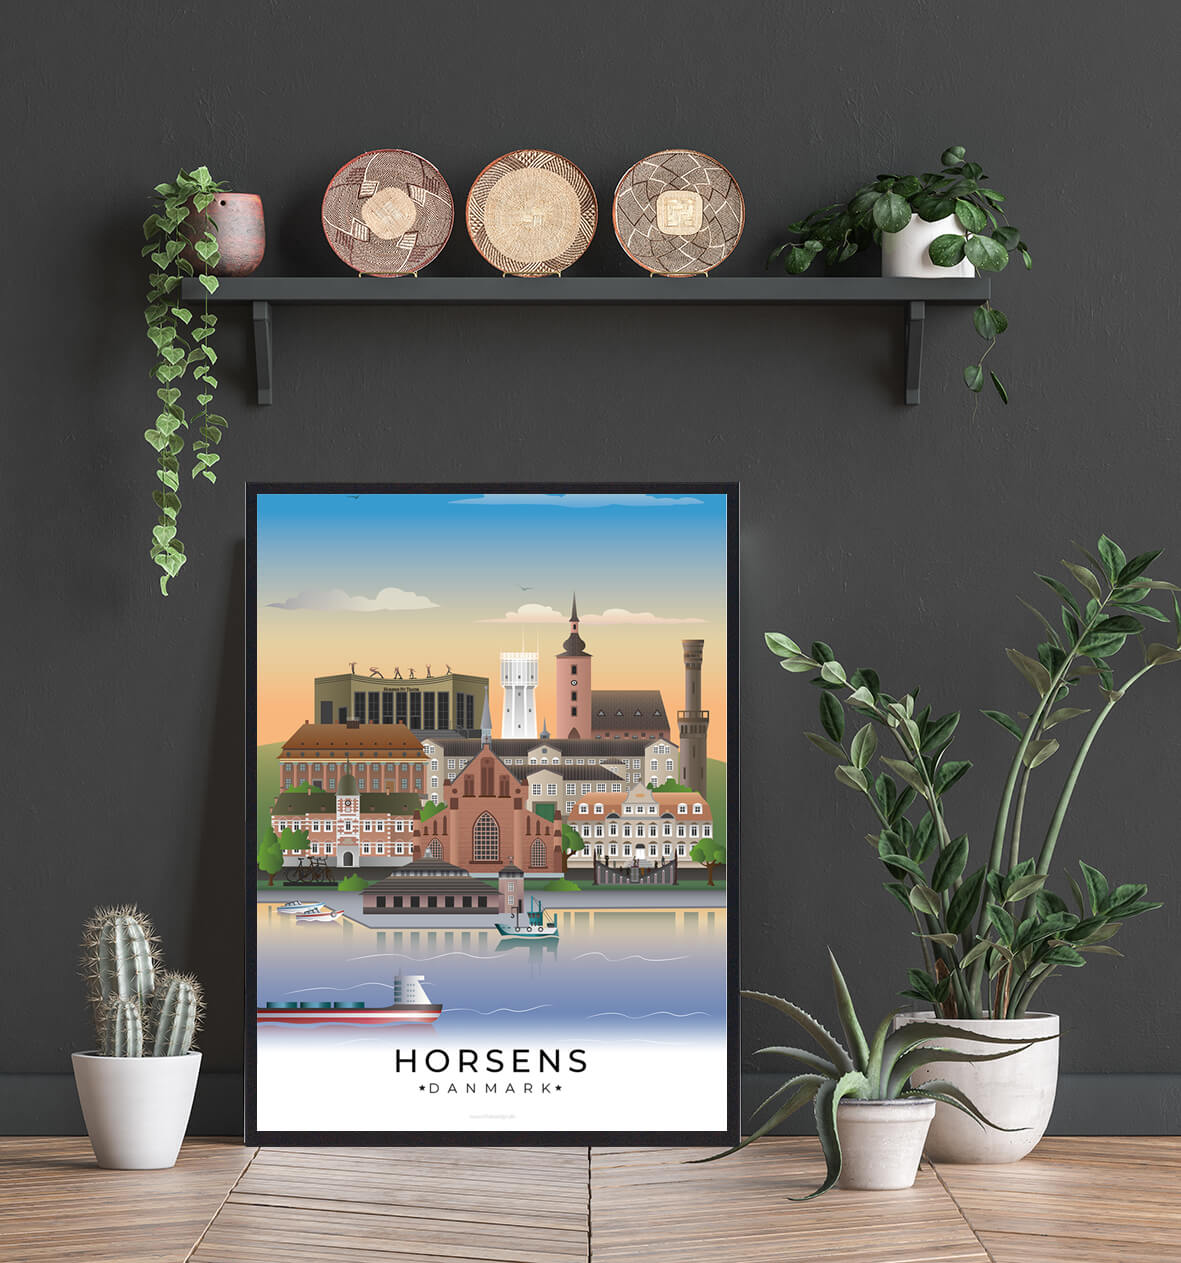 Horsens-plakat-boligen-1